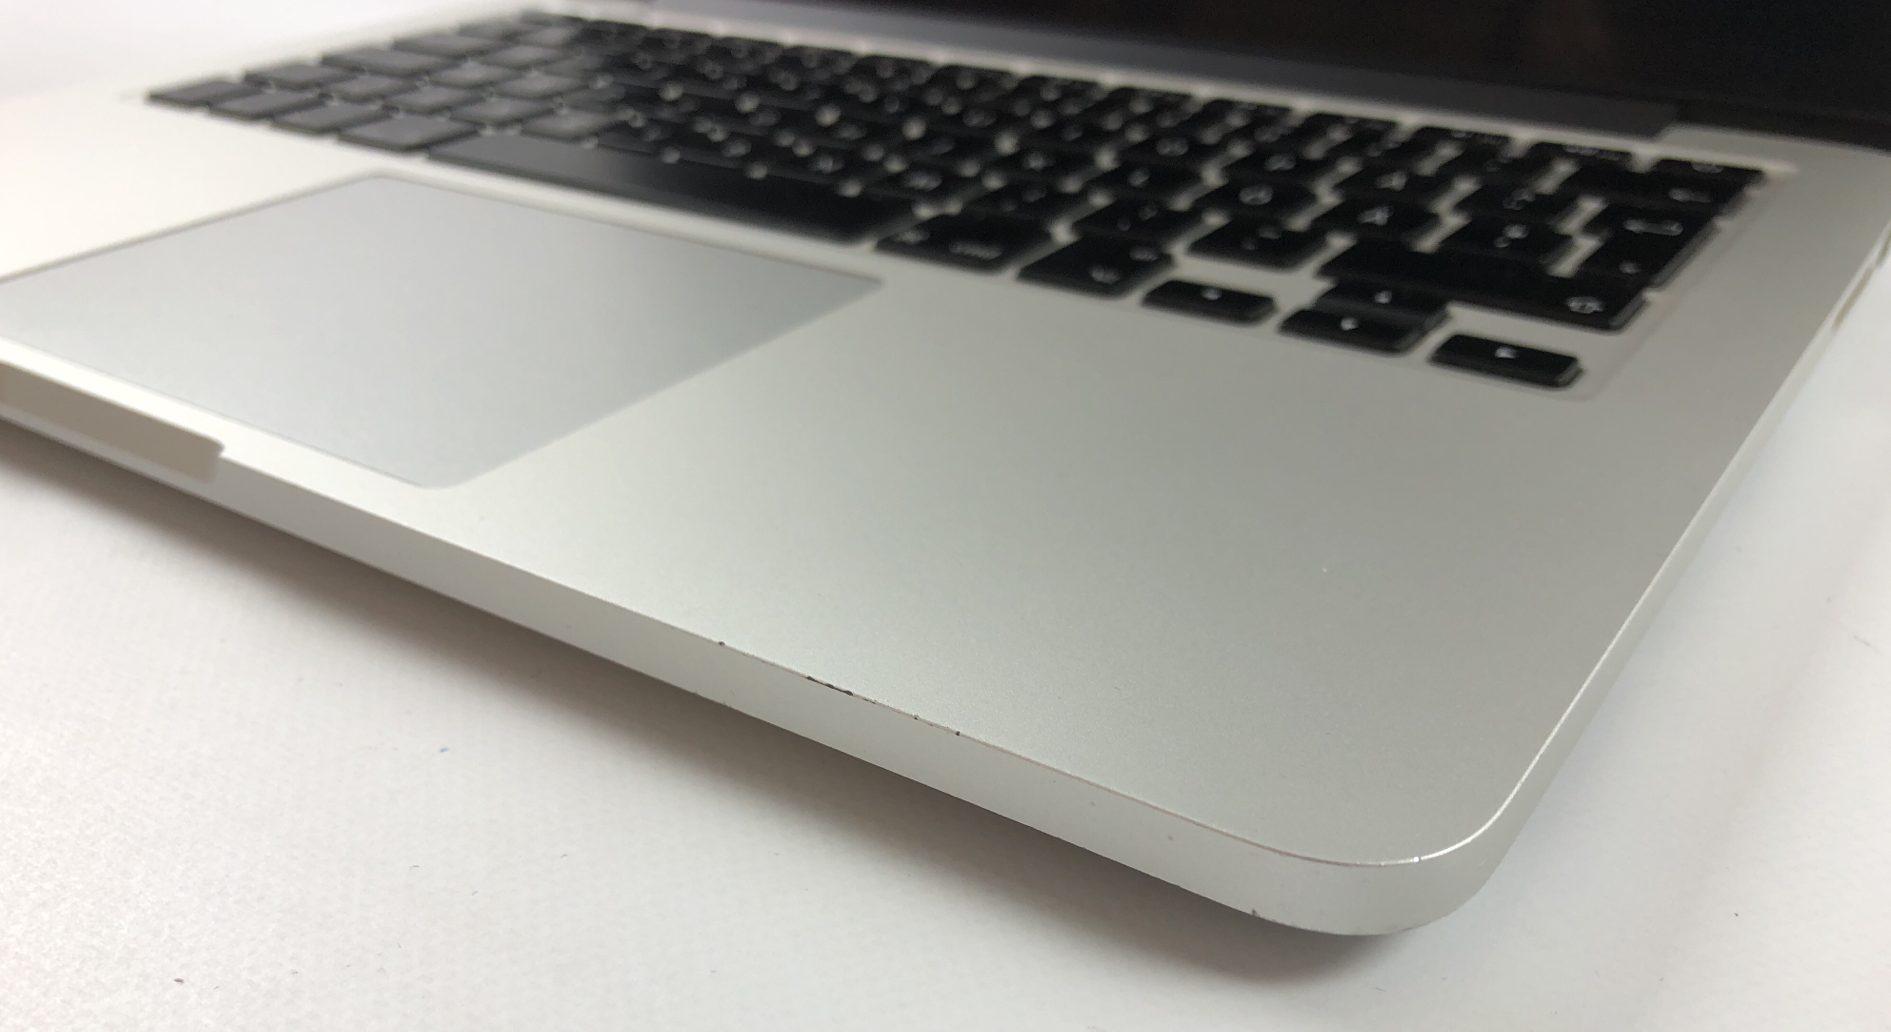 "MacBook Pro Retina 13"" Mid 2014 (Intel Core i5 2.8 GHz 16 GB RAM 512 GB SSD), Intel Core i5 2.8 GHz, 16 GB RAM, 512 GB SSD, bild 4"